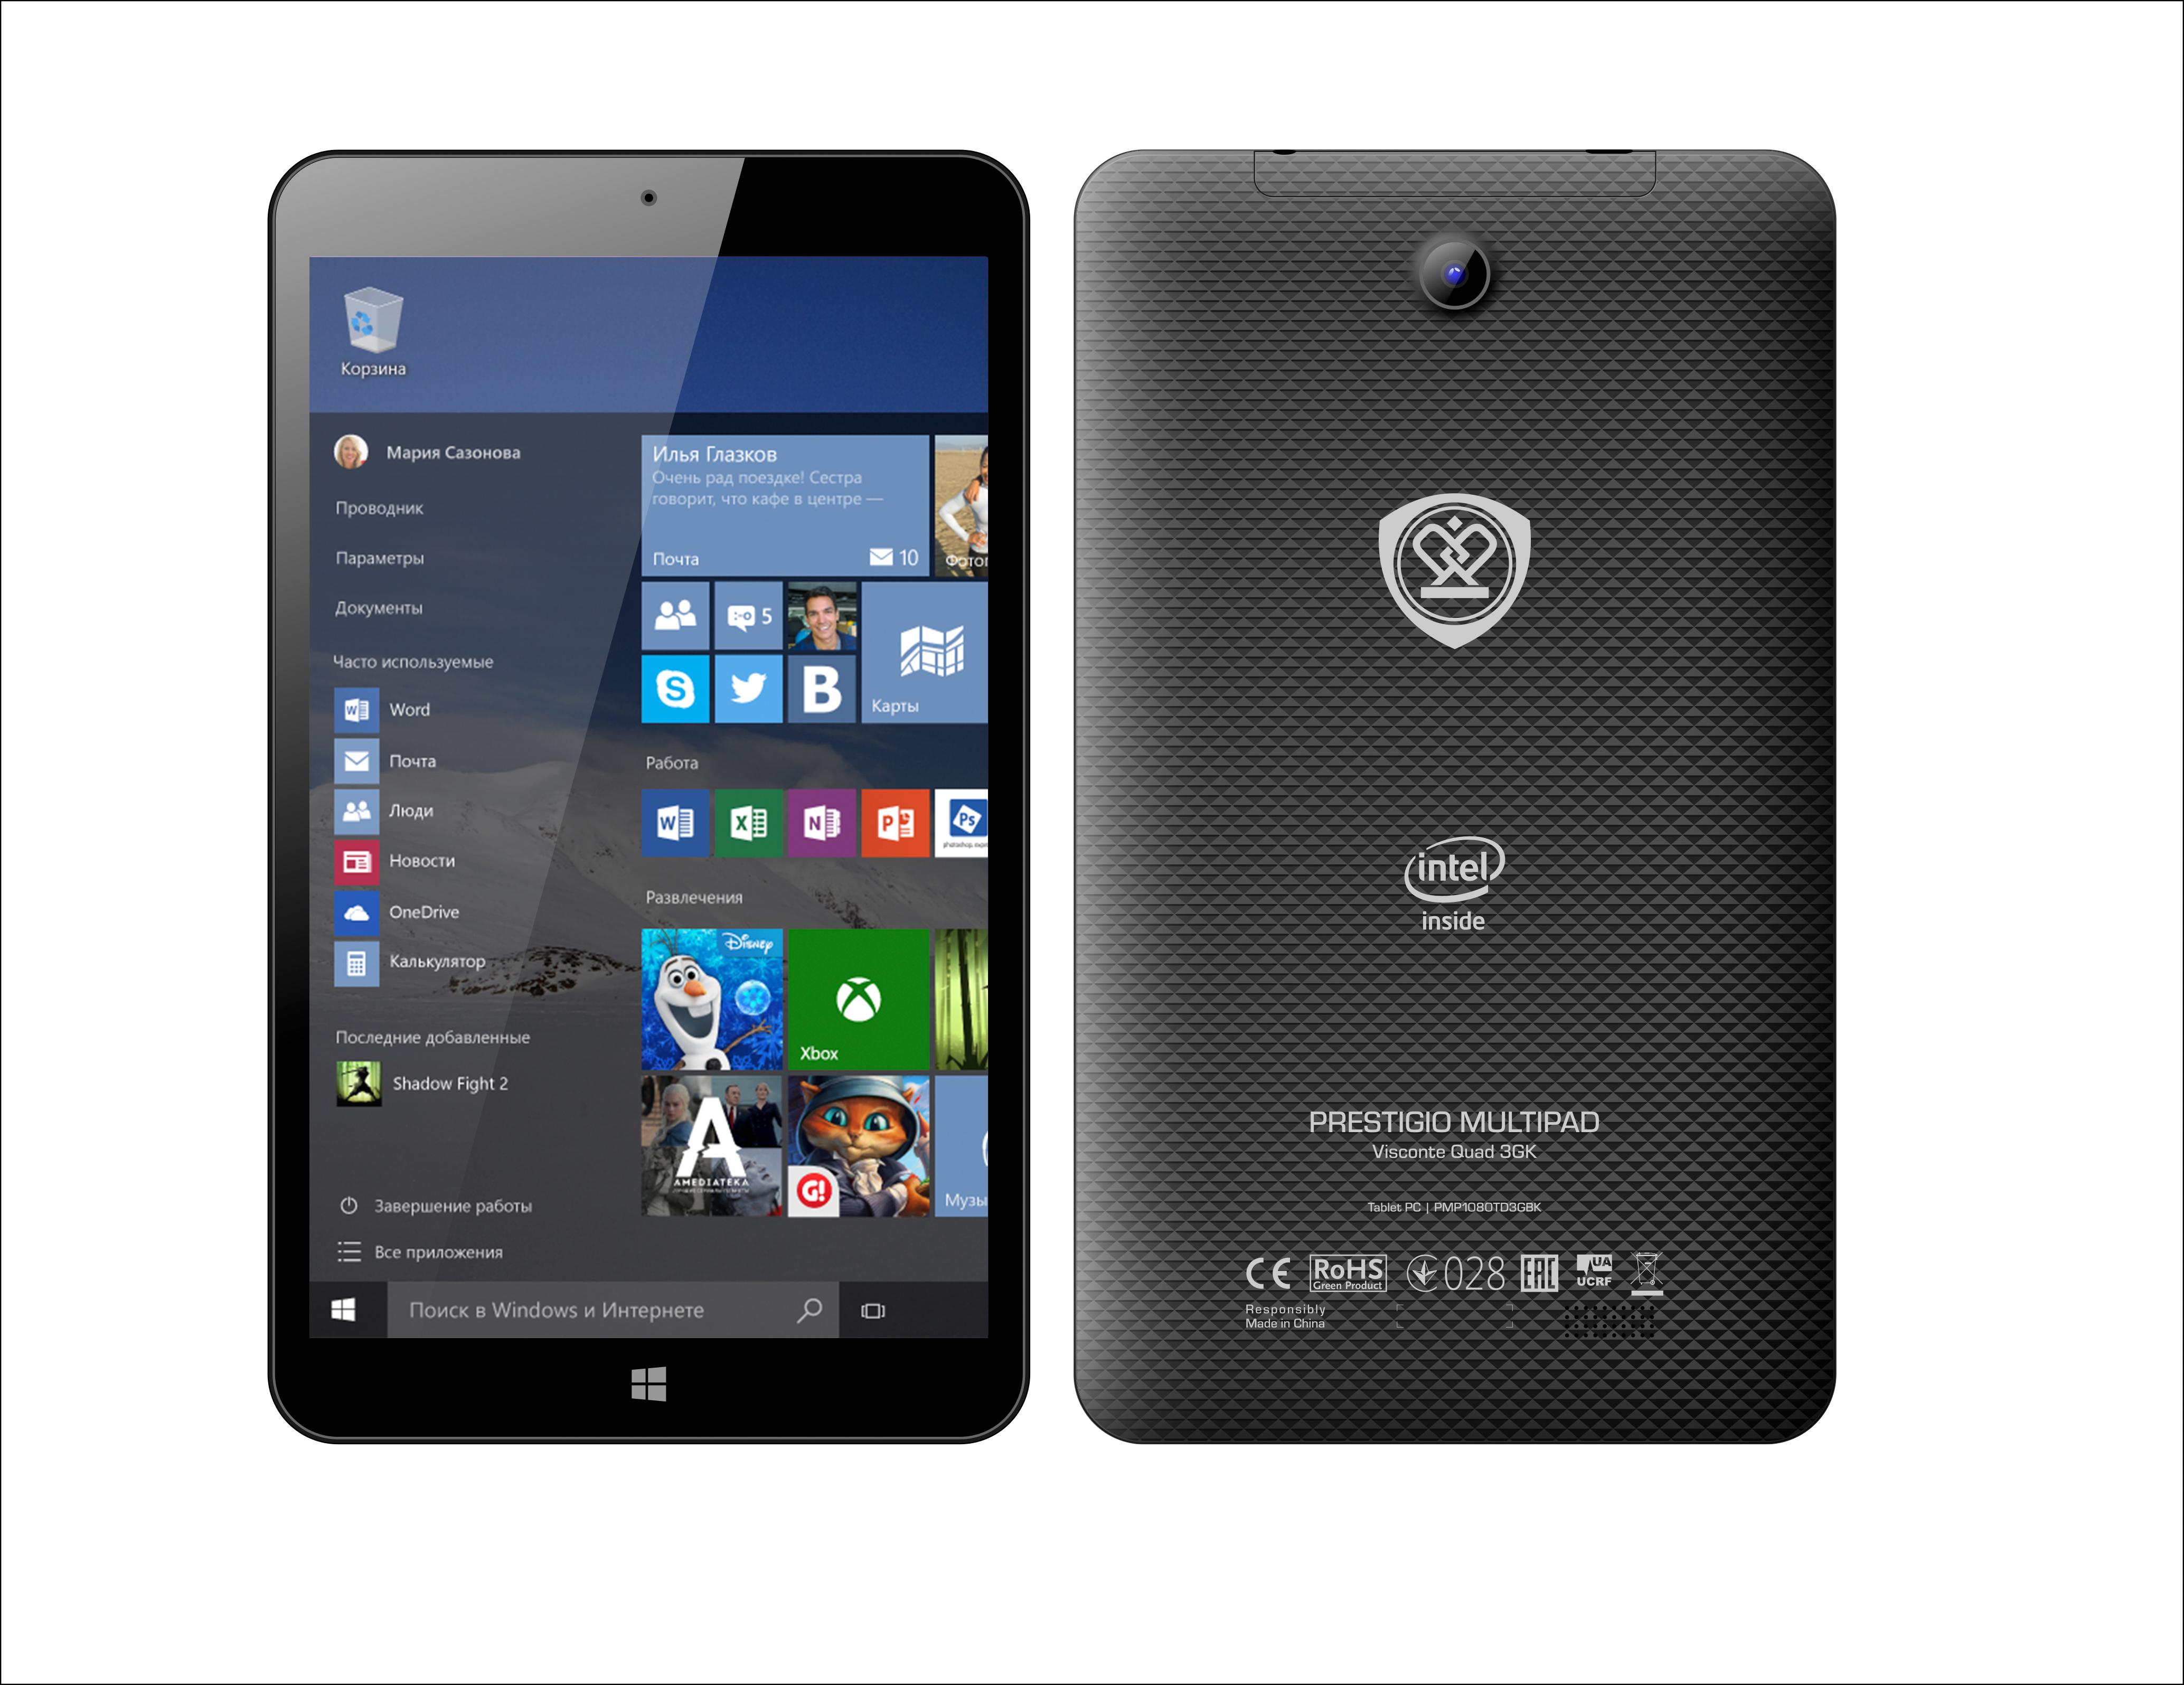 Планшет Prestigio Multipad Visconte Quad 3GK на базе Windows 10 доступен за  6990 рублей